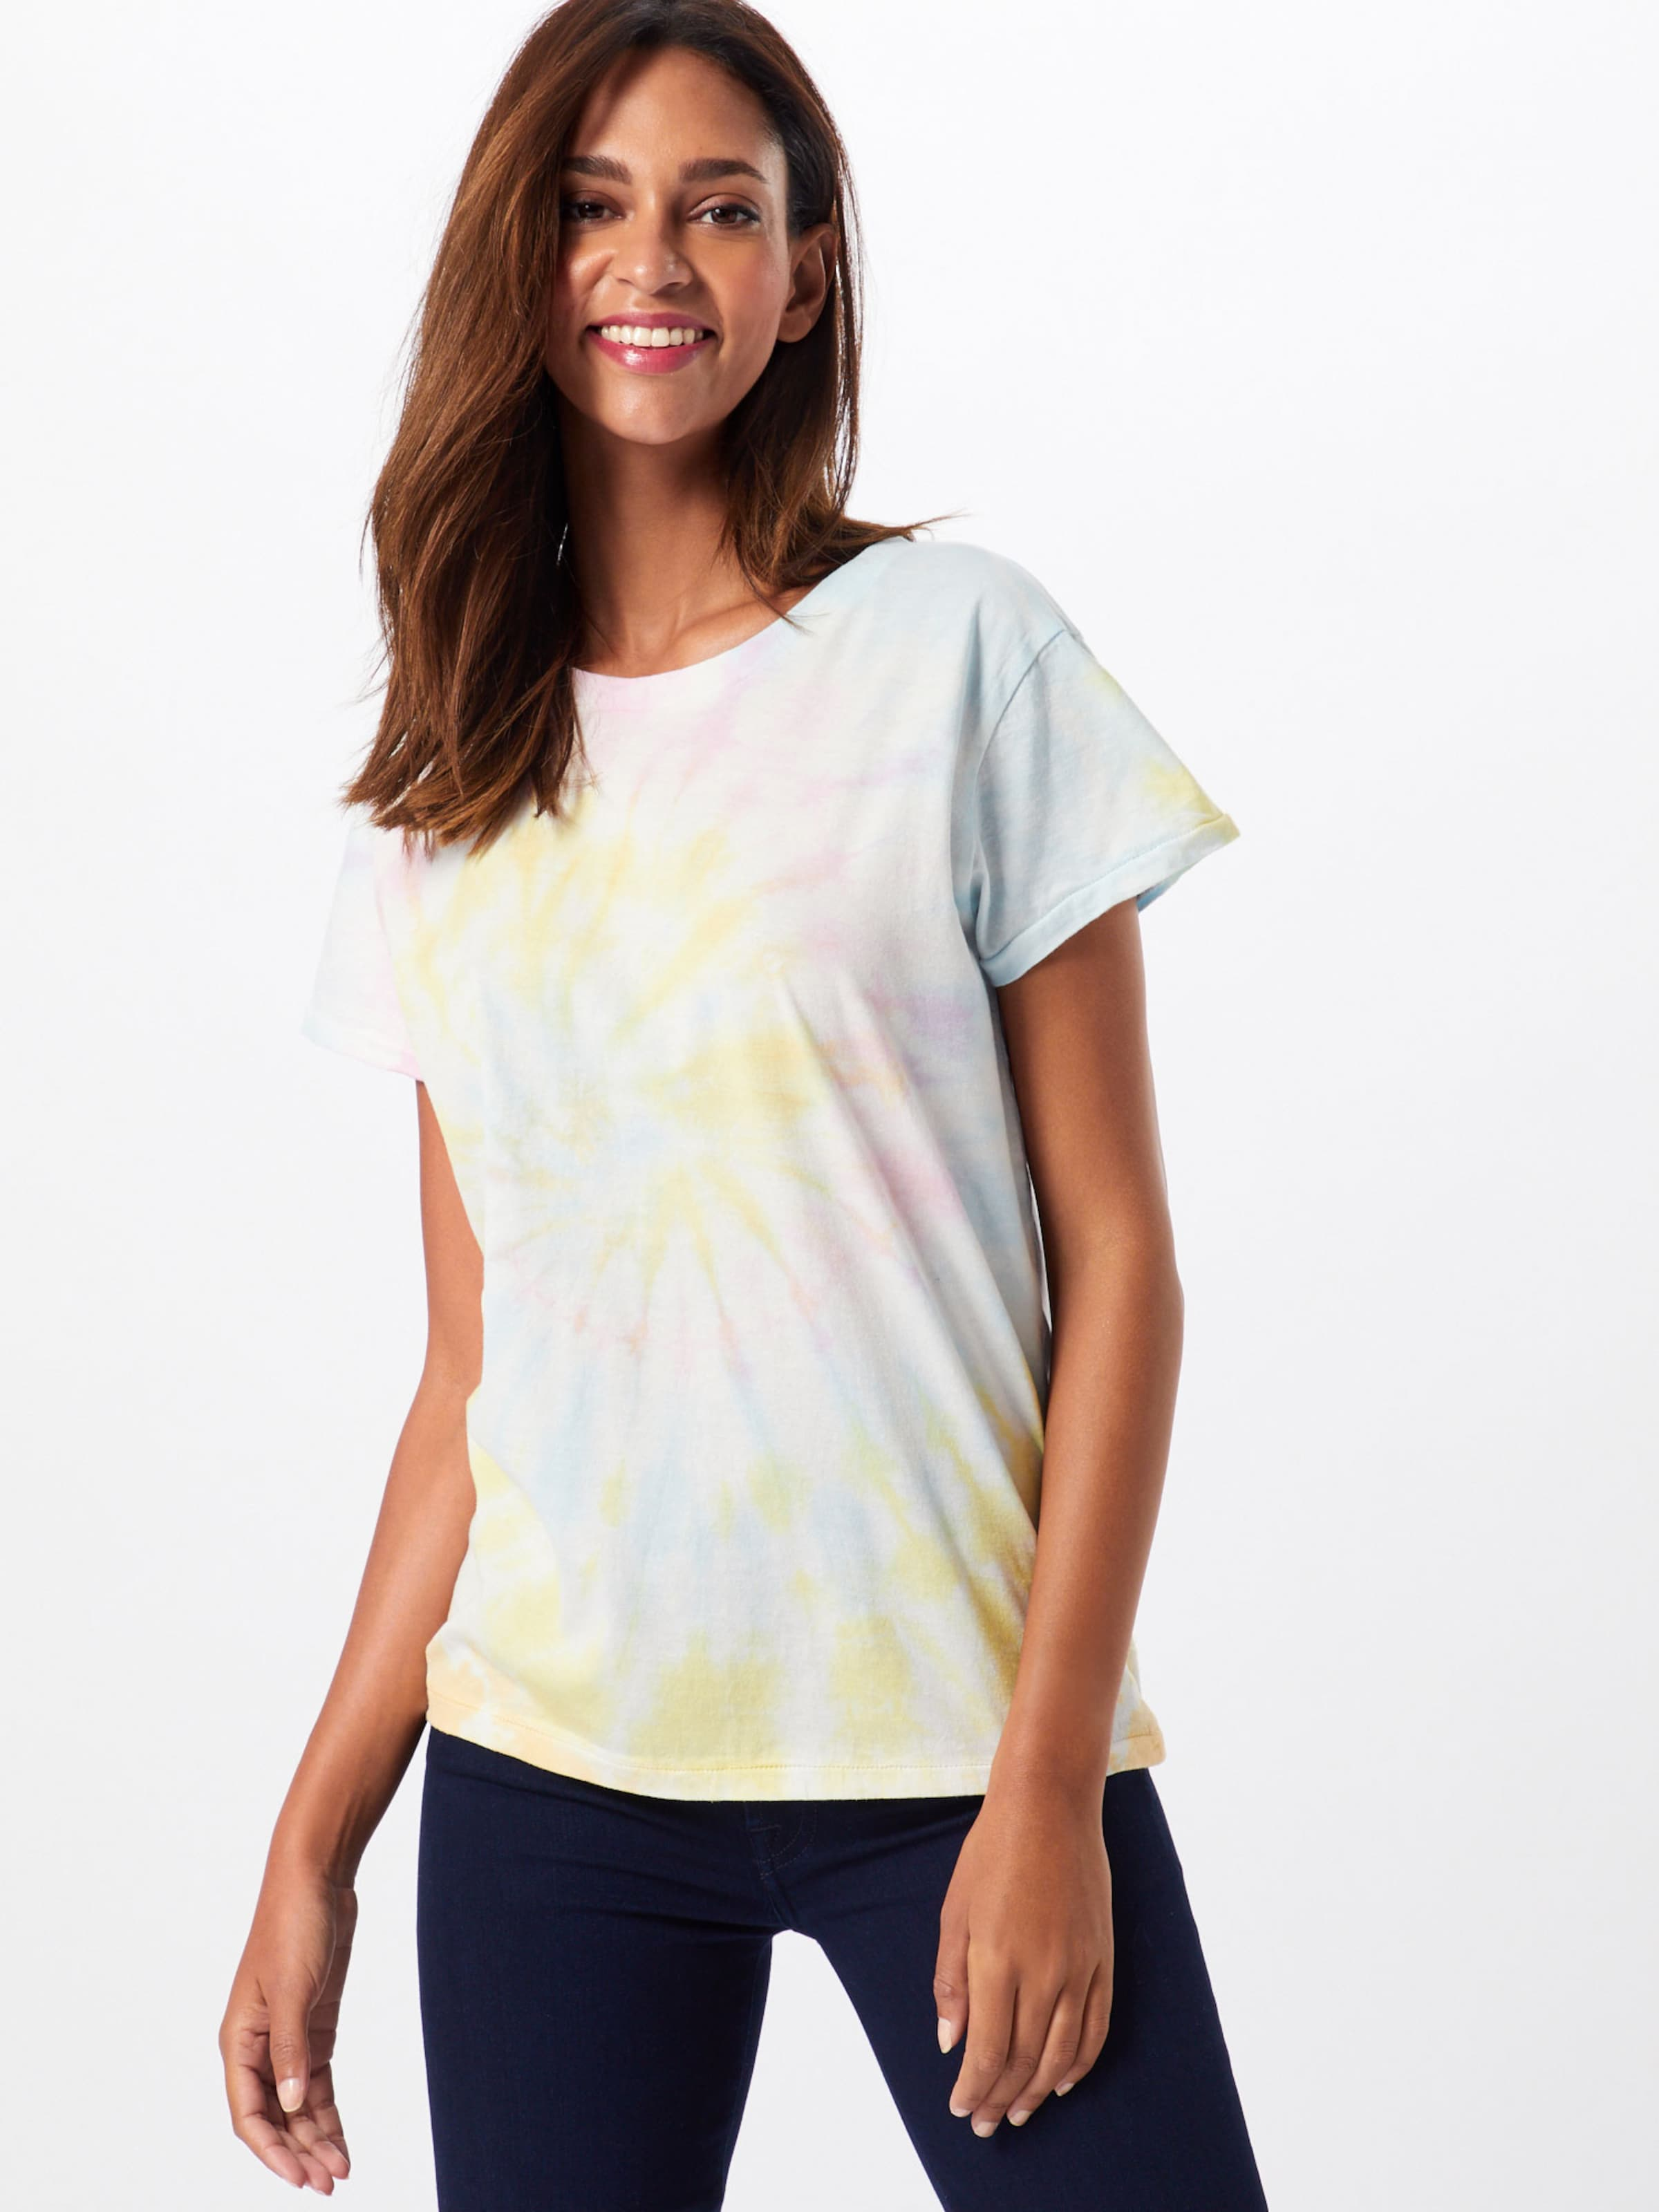 La Shirt Dye 'tie Ragdoll Tee' In Mischfarben Vintage 1ulFKJ5Tc3